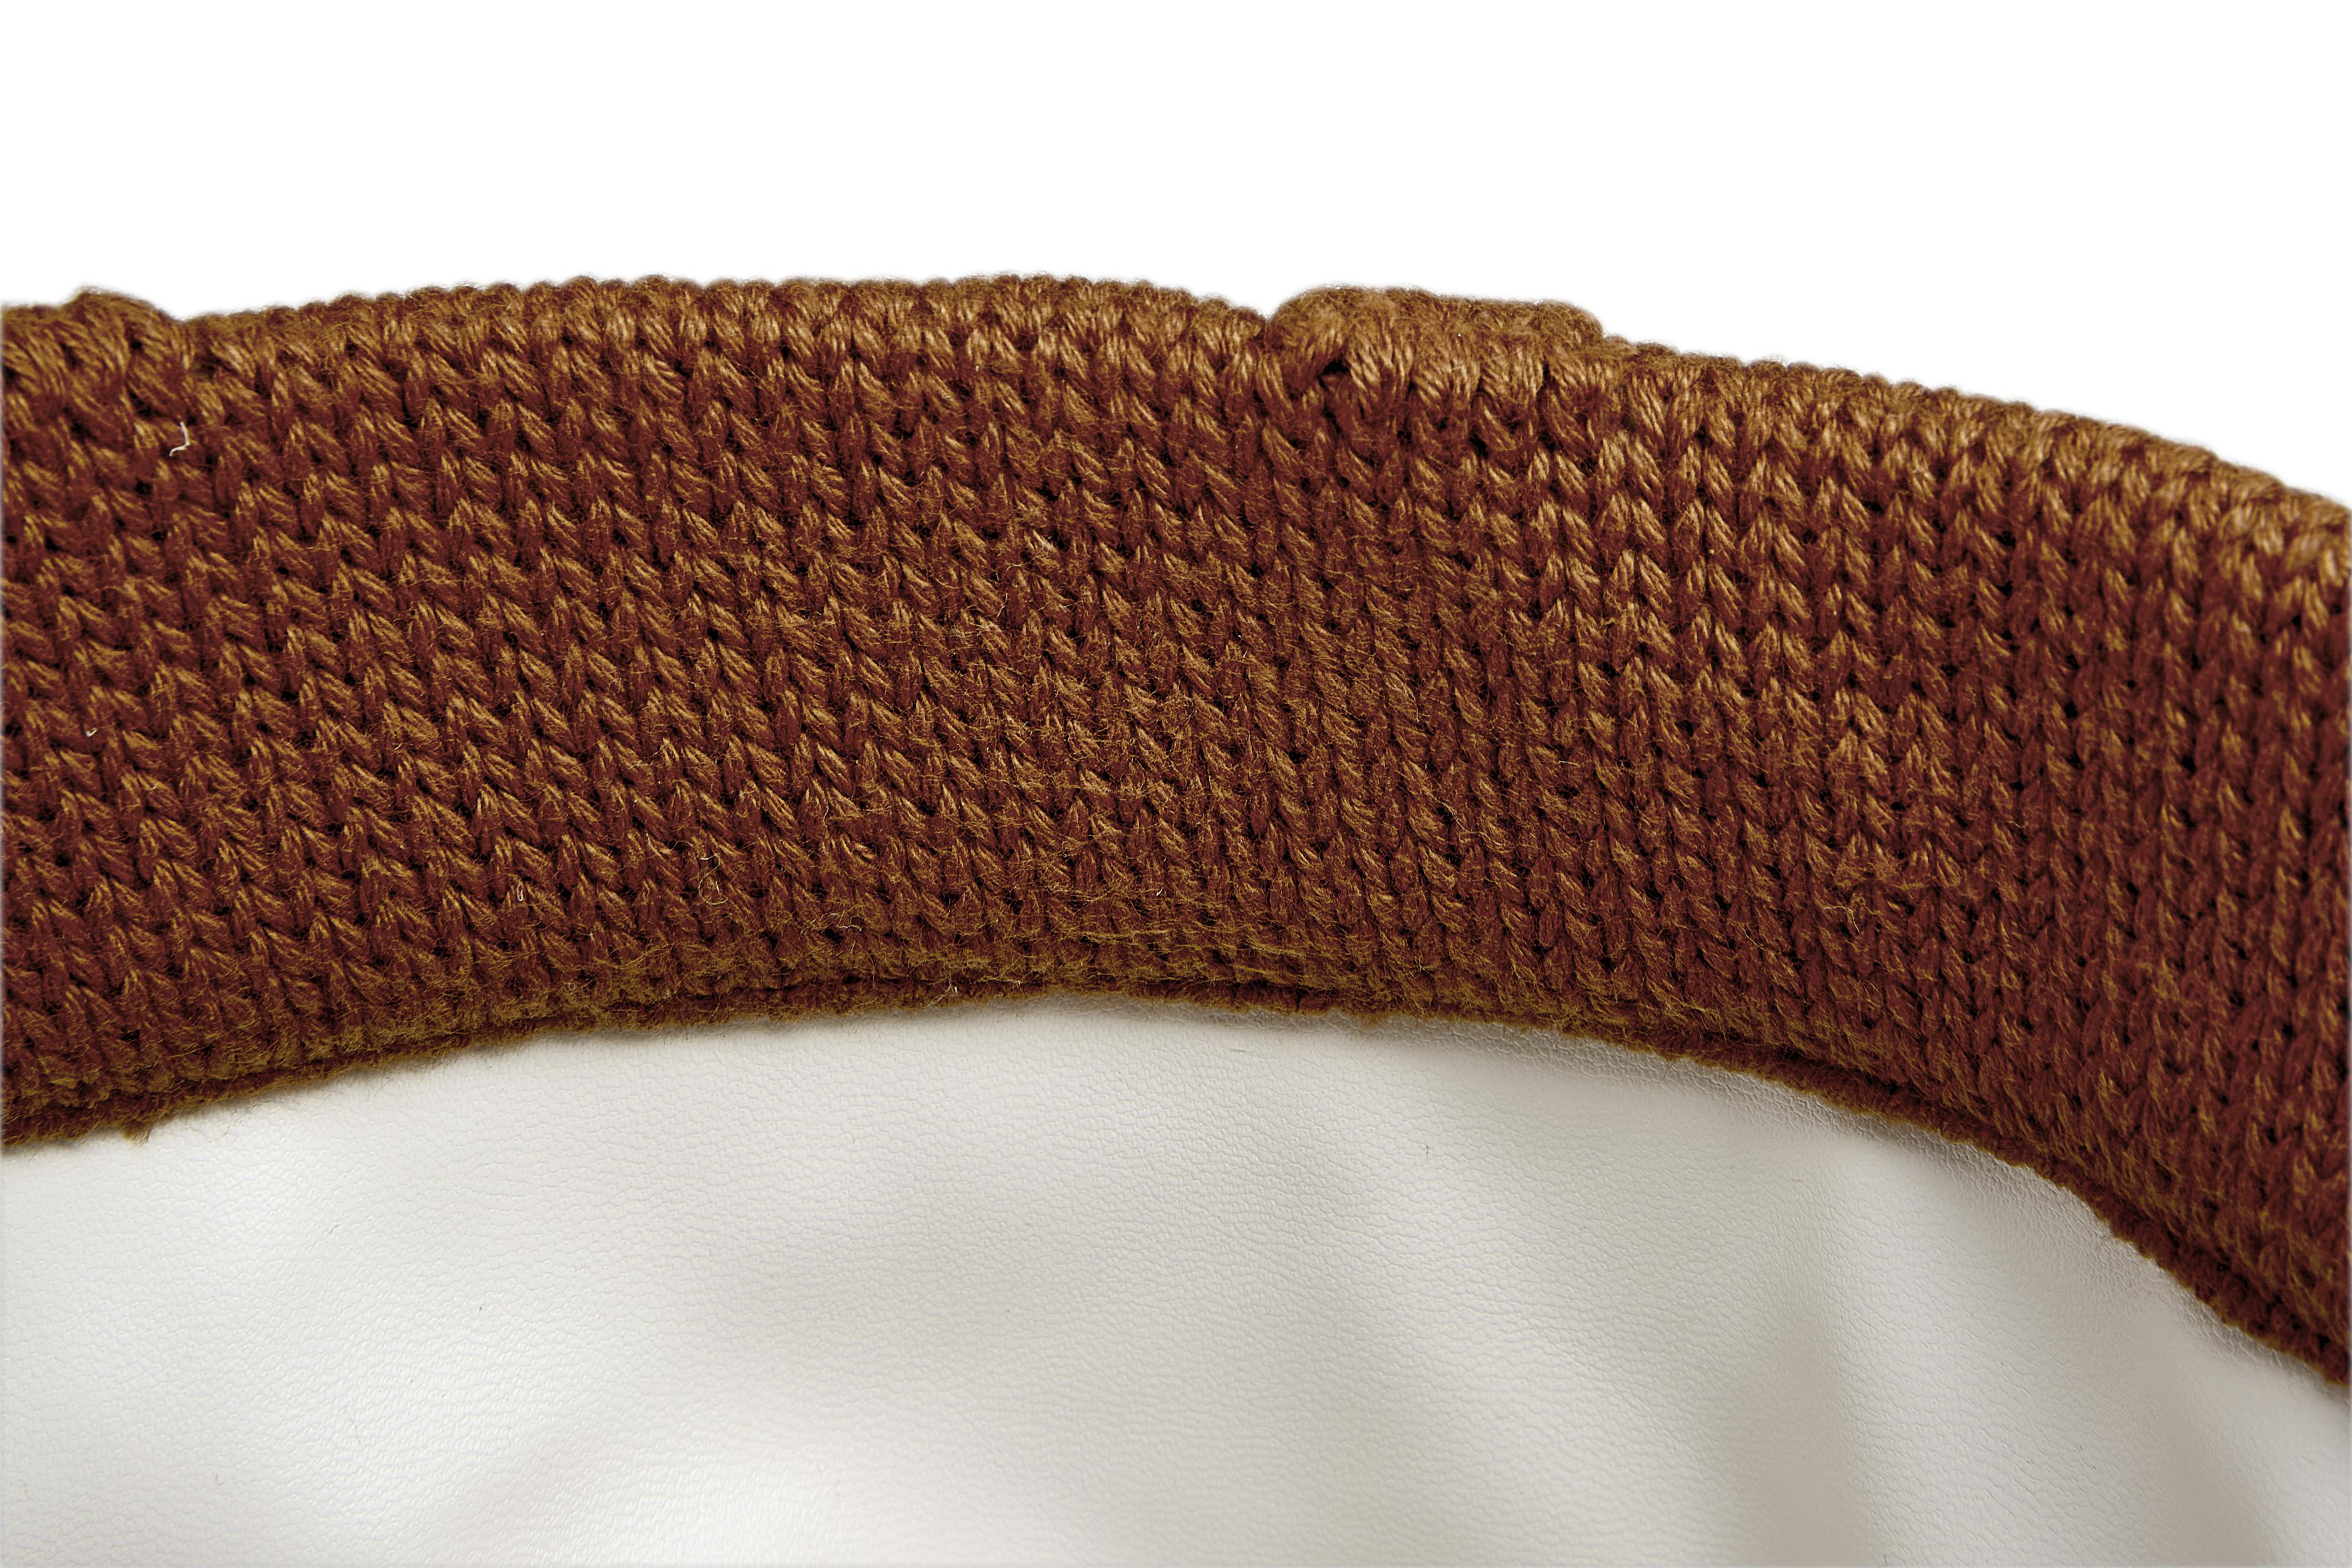 Commodemand Small Knots - Camel - 21x16xh16cm